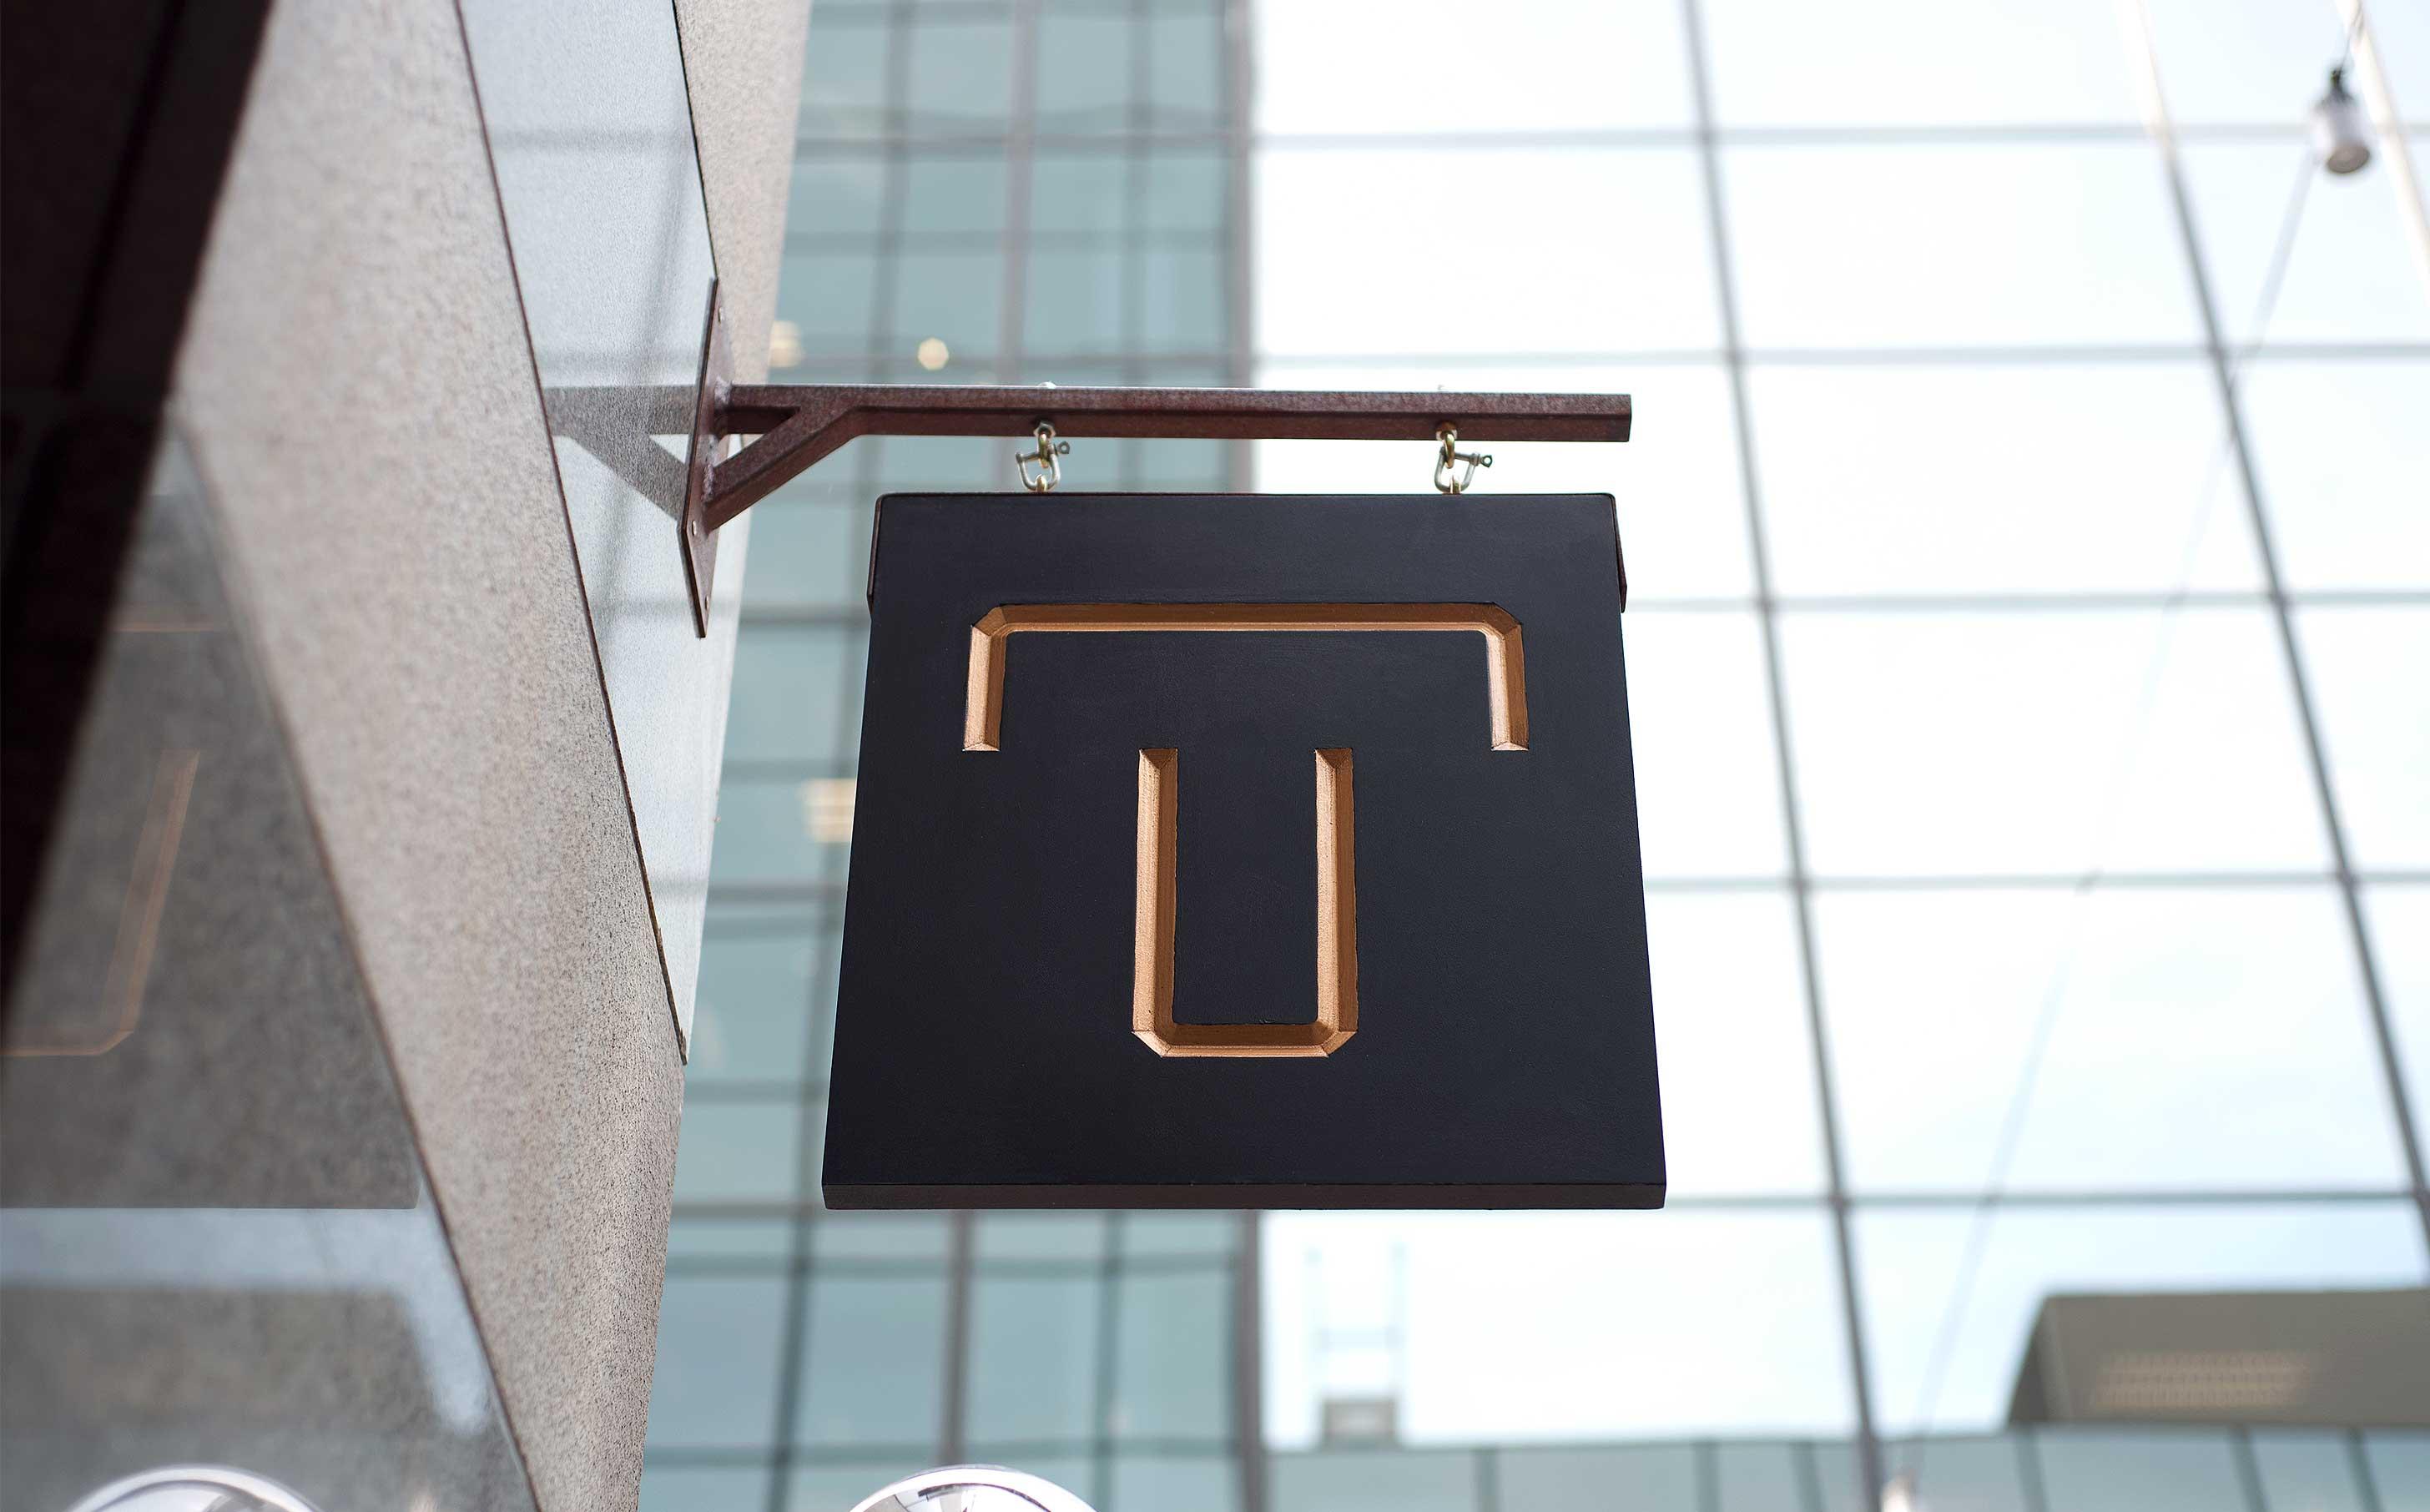 trade-union-logo-sign